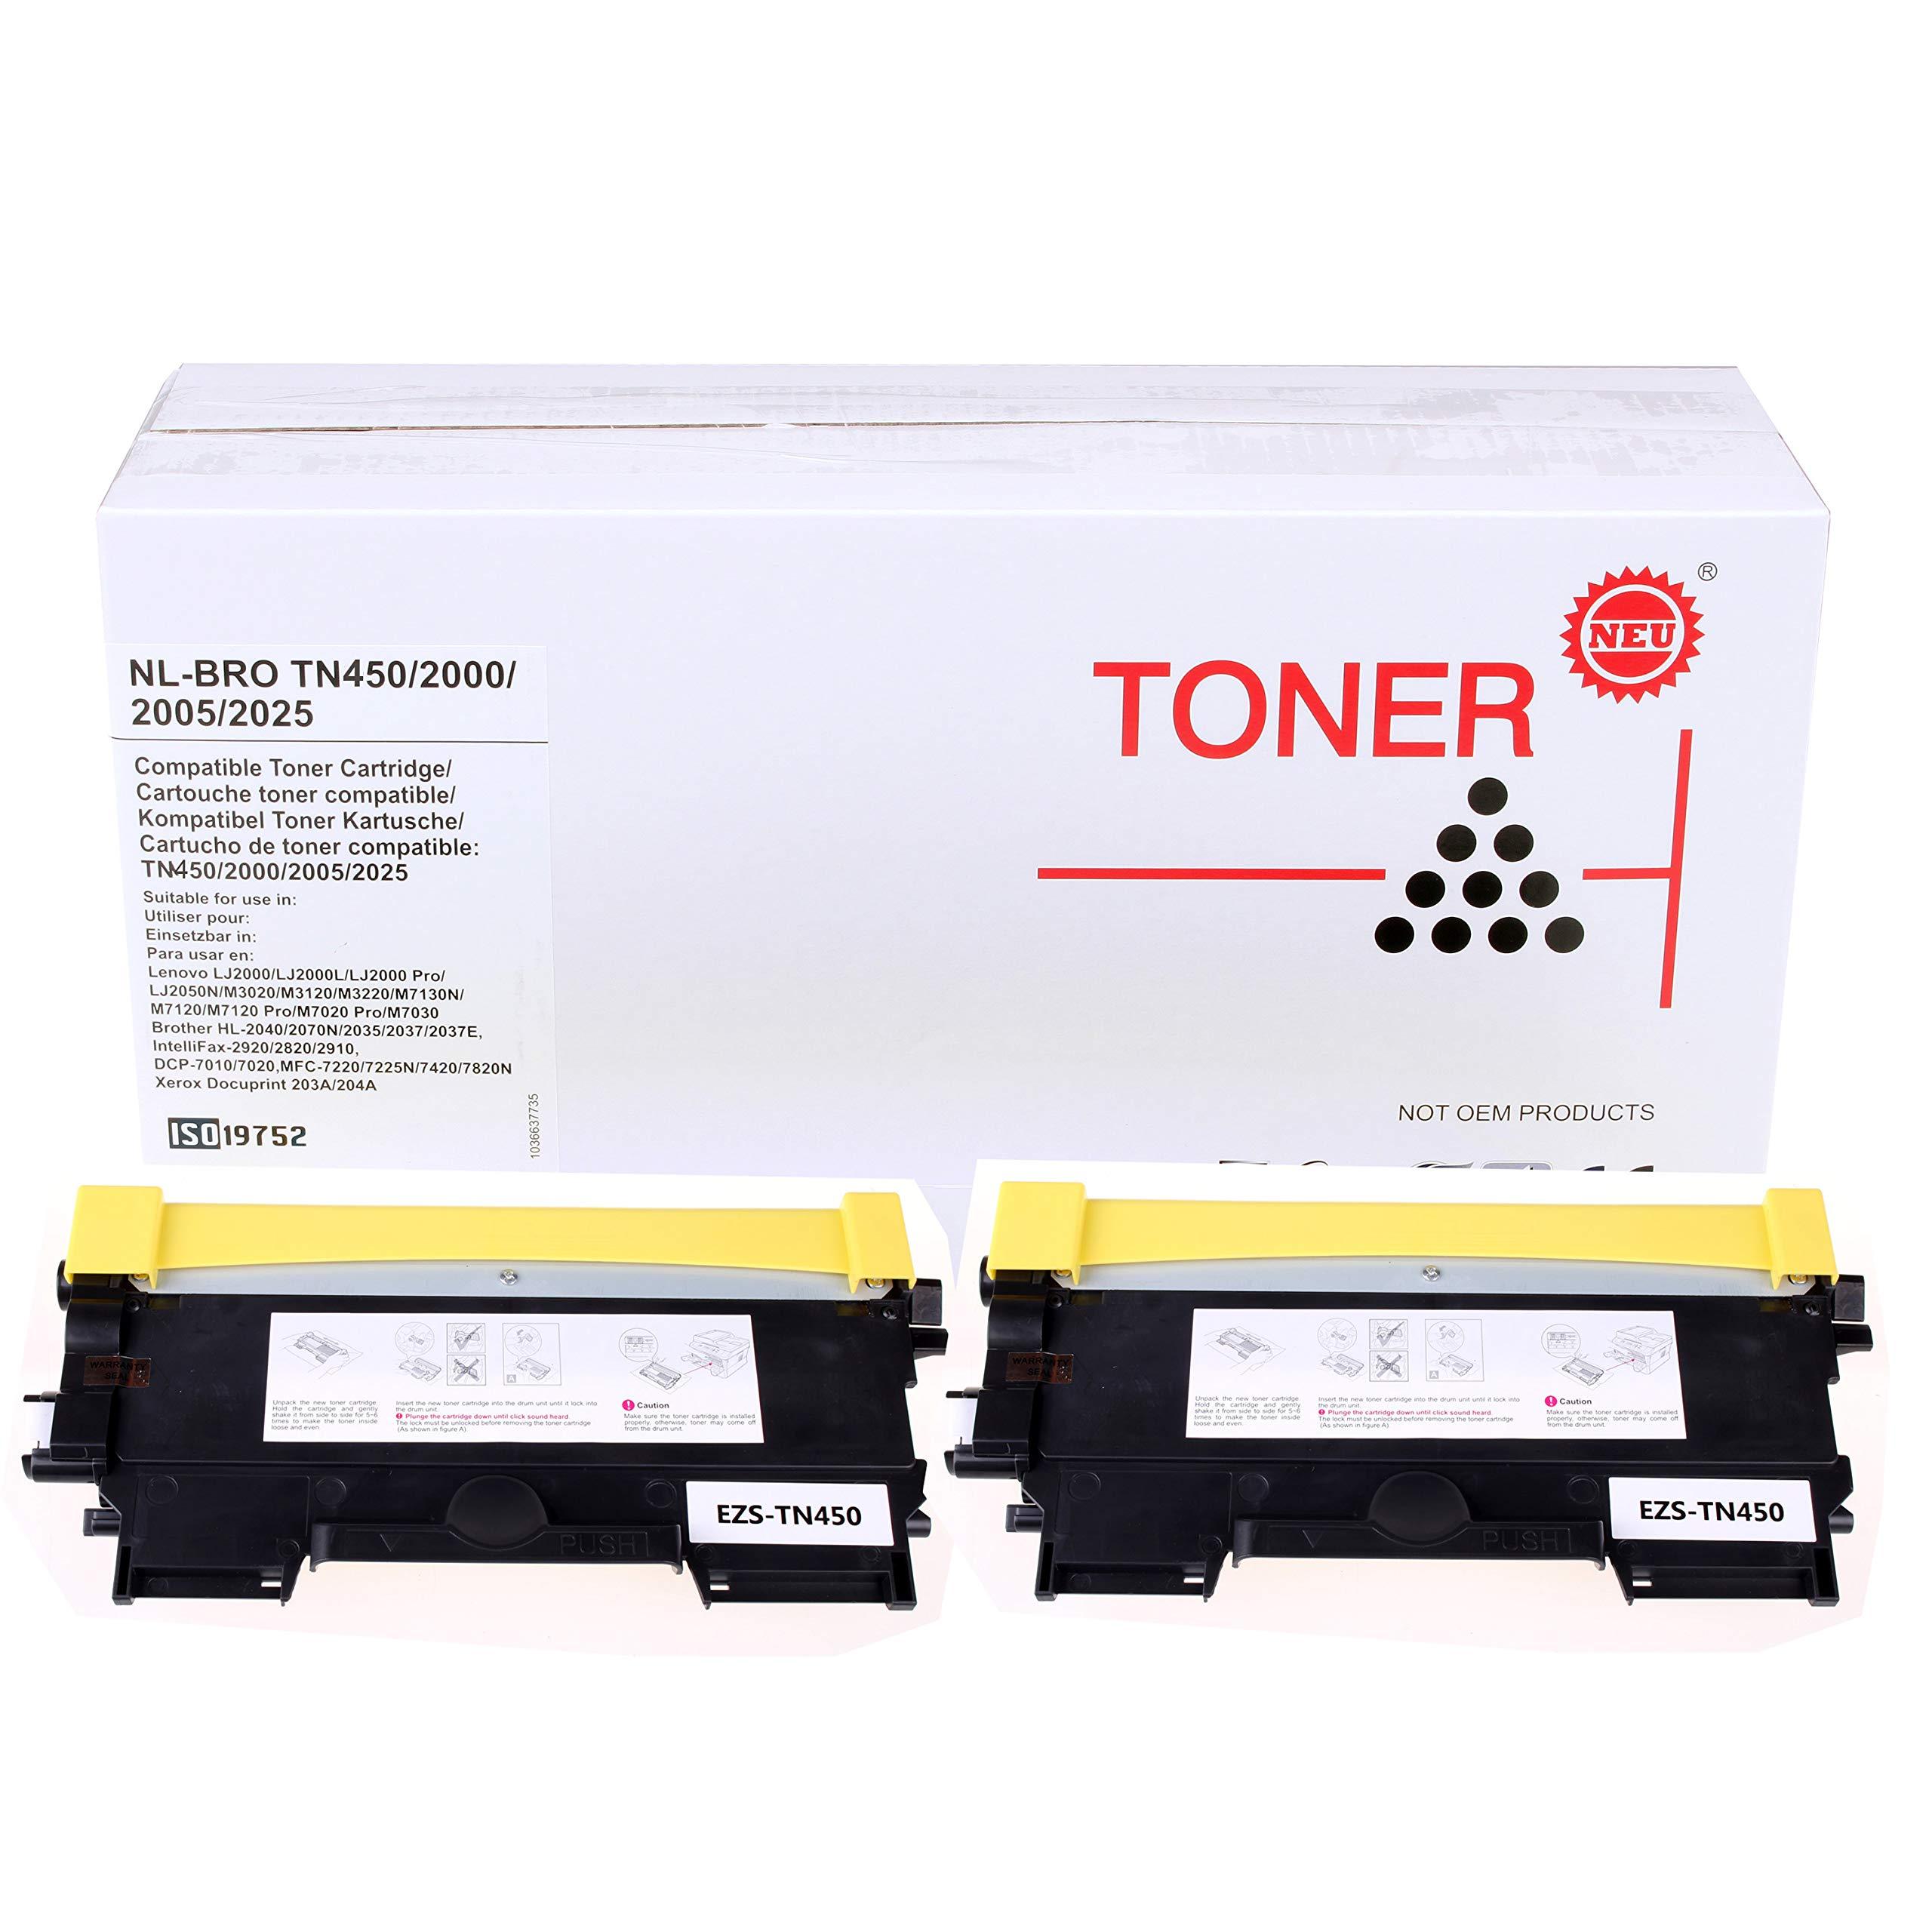 ZQL TN450 TN-450 (Black, High Yield, 2 Pack) Compatible Toner Cartridges Brother HL-2240 HL-2240D HL-2270DW HL-2280DW MFC-7240 MFC-7460DN MFC-7860DW by ZQL